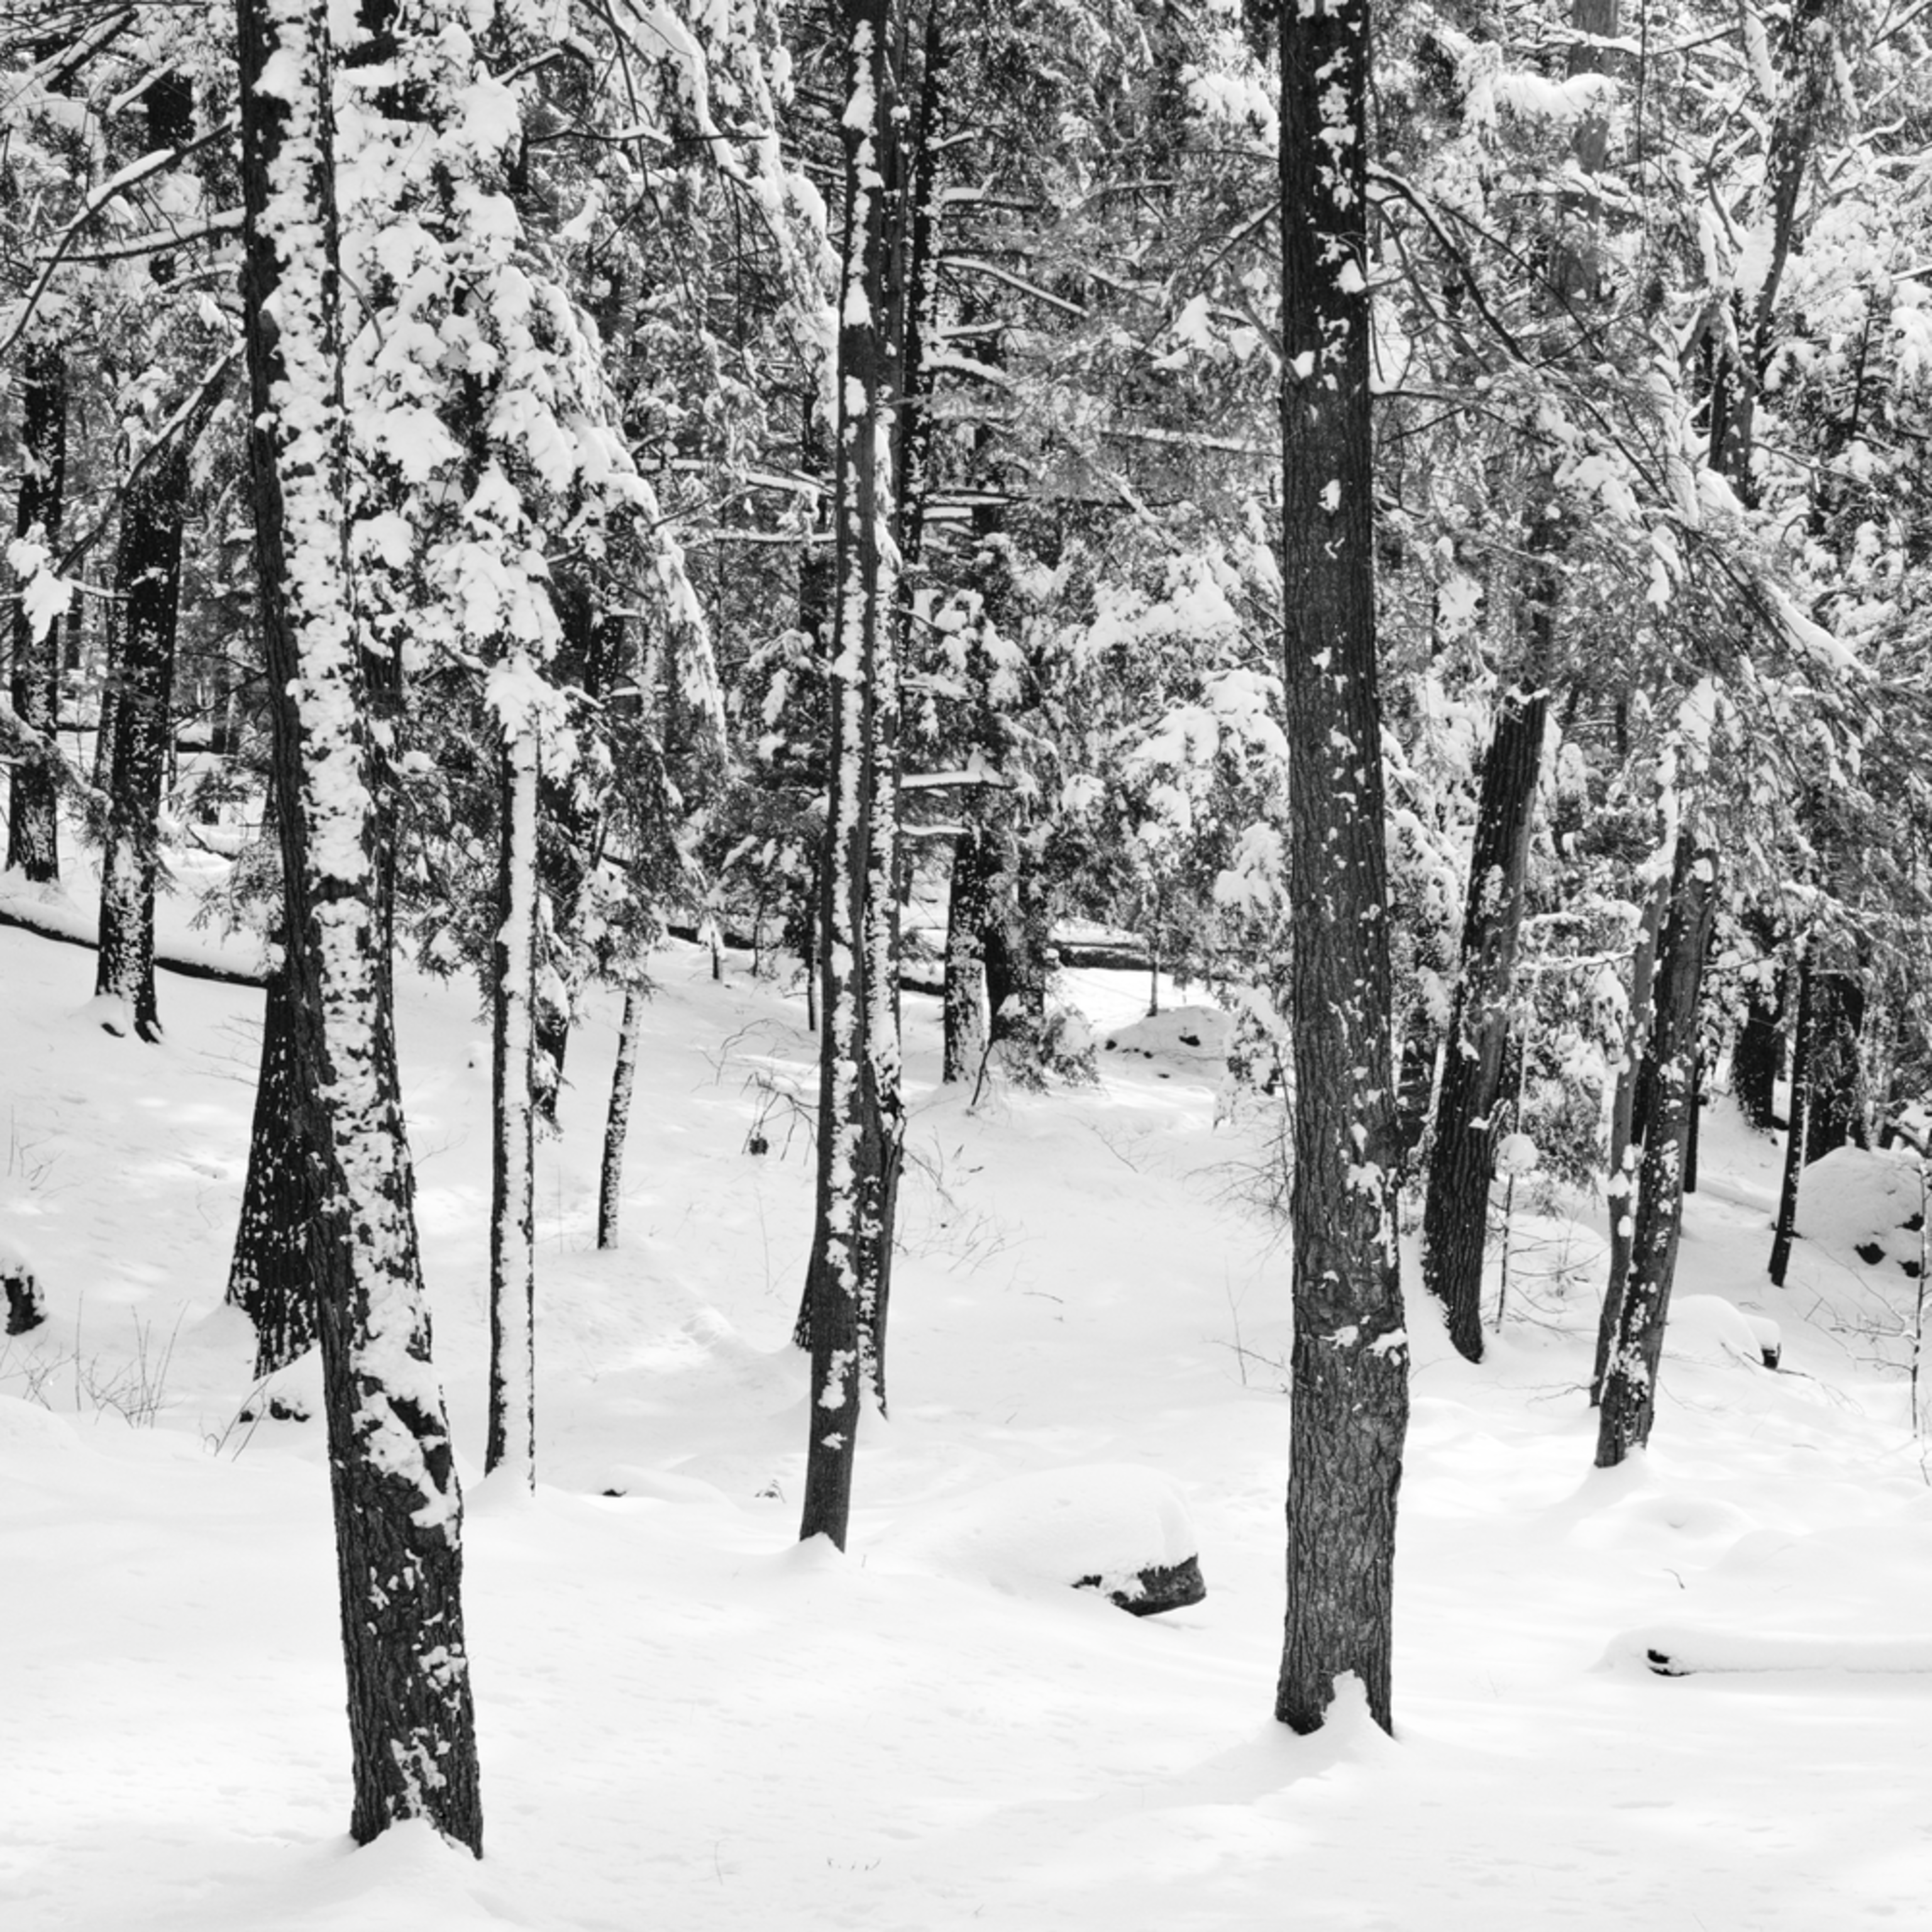 Valhalla nature fresh snow forest scene pano 1 wklxpi